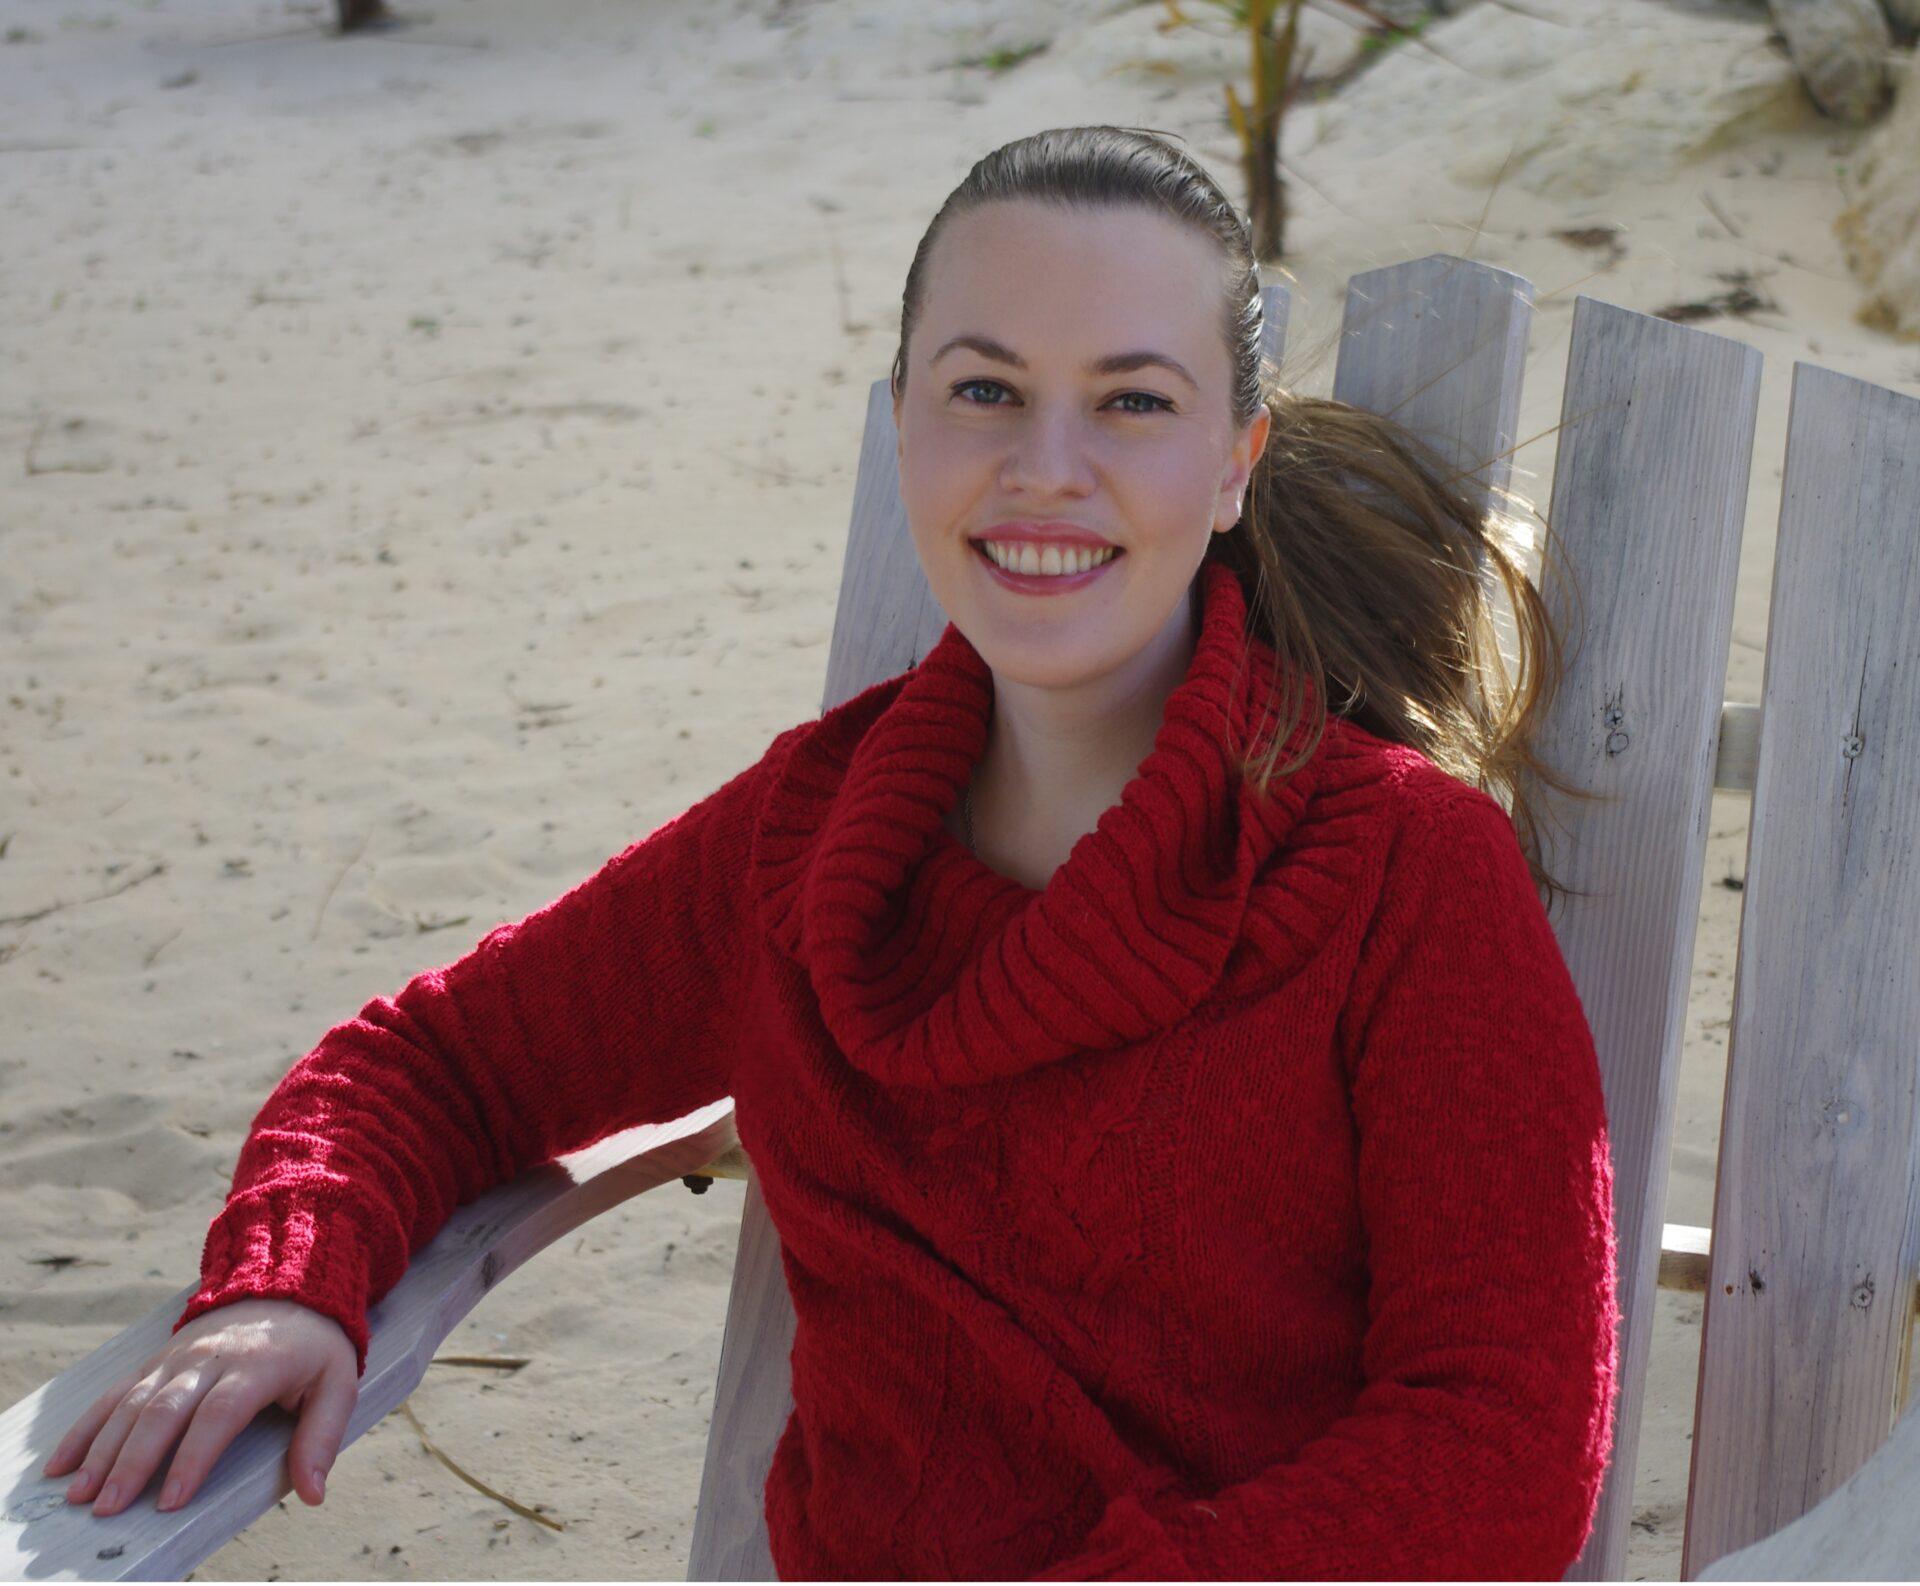 RedSweater2